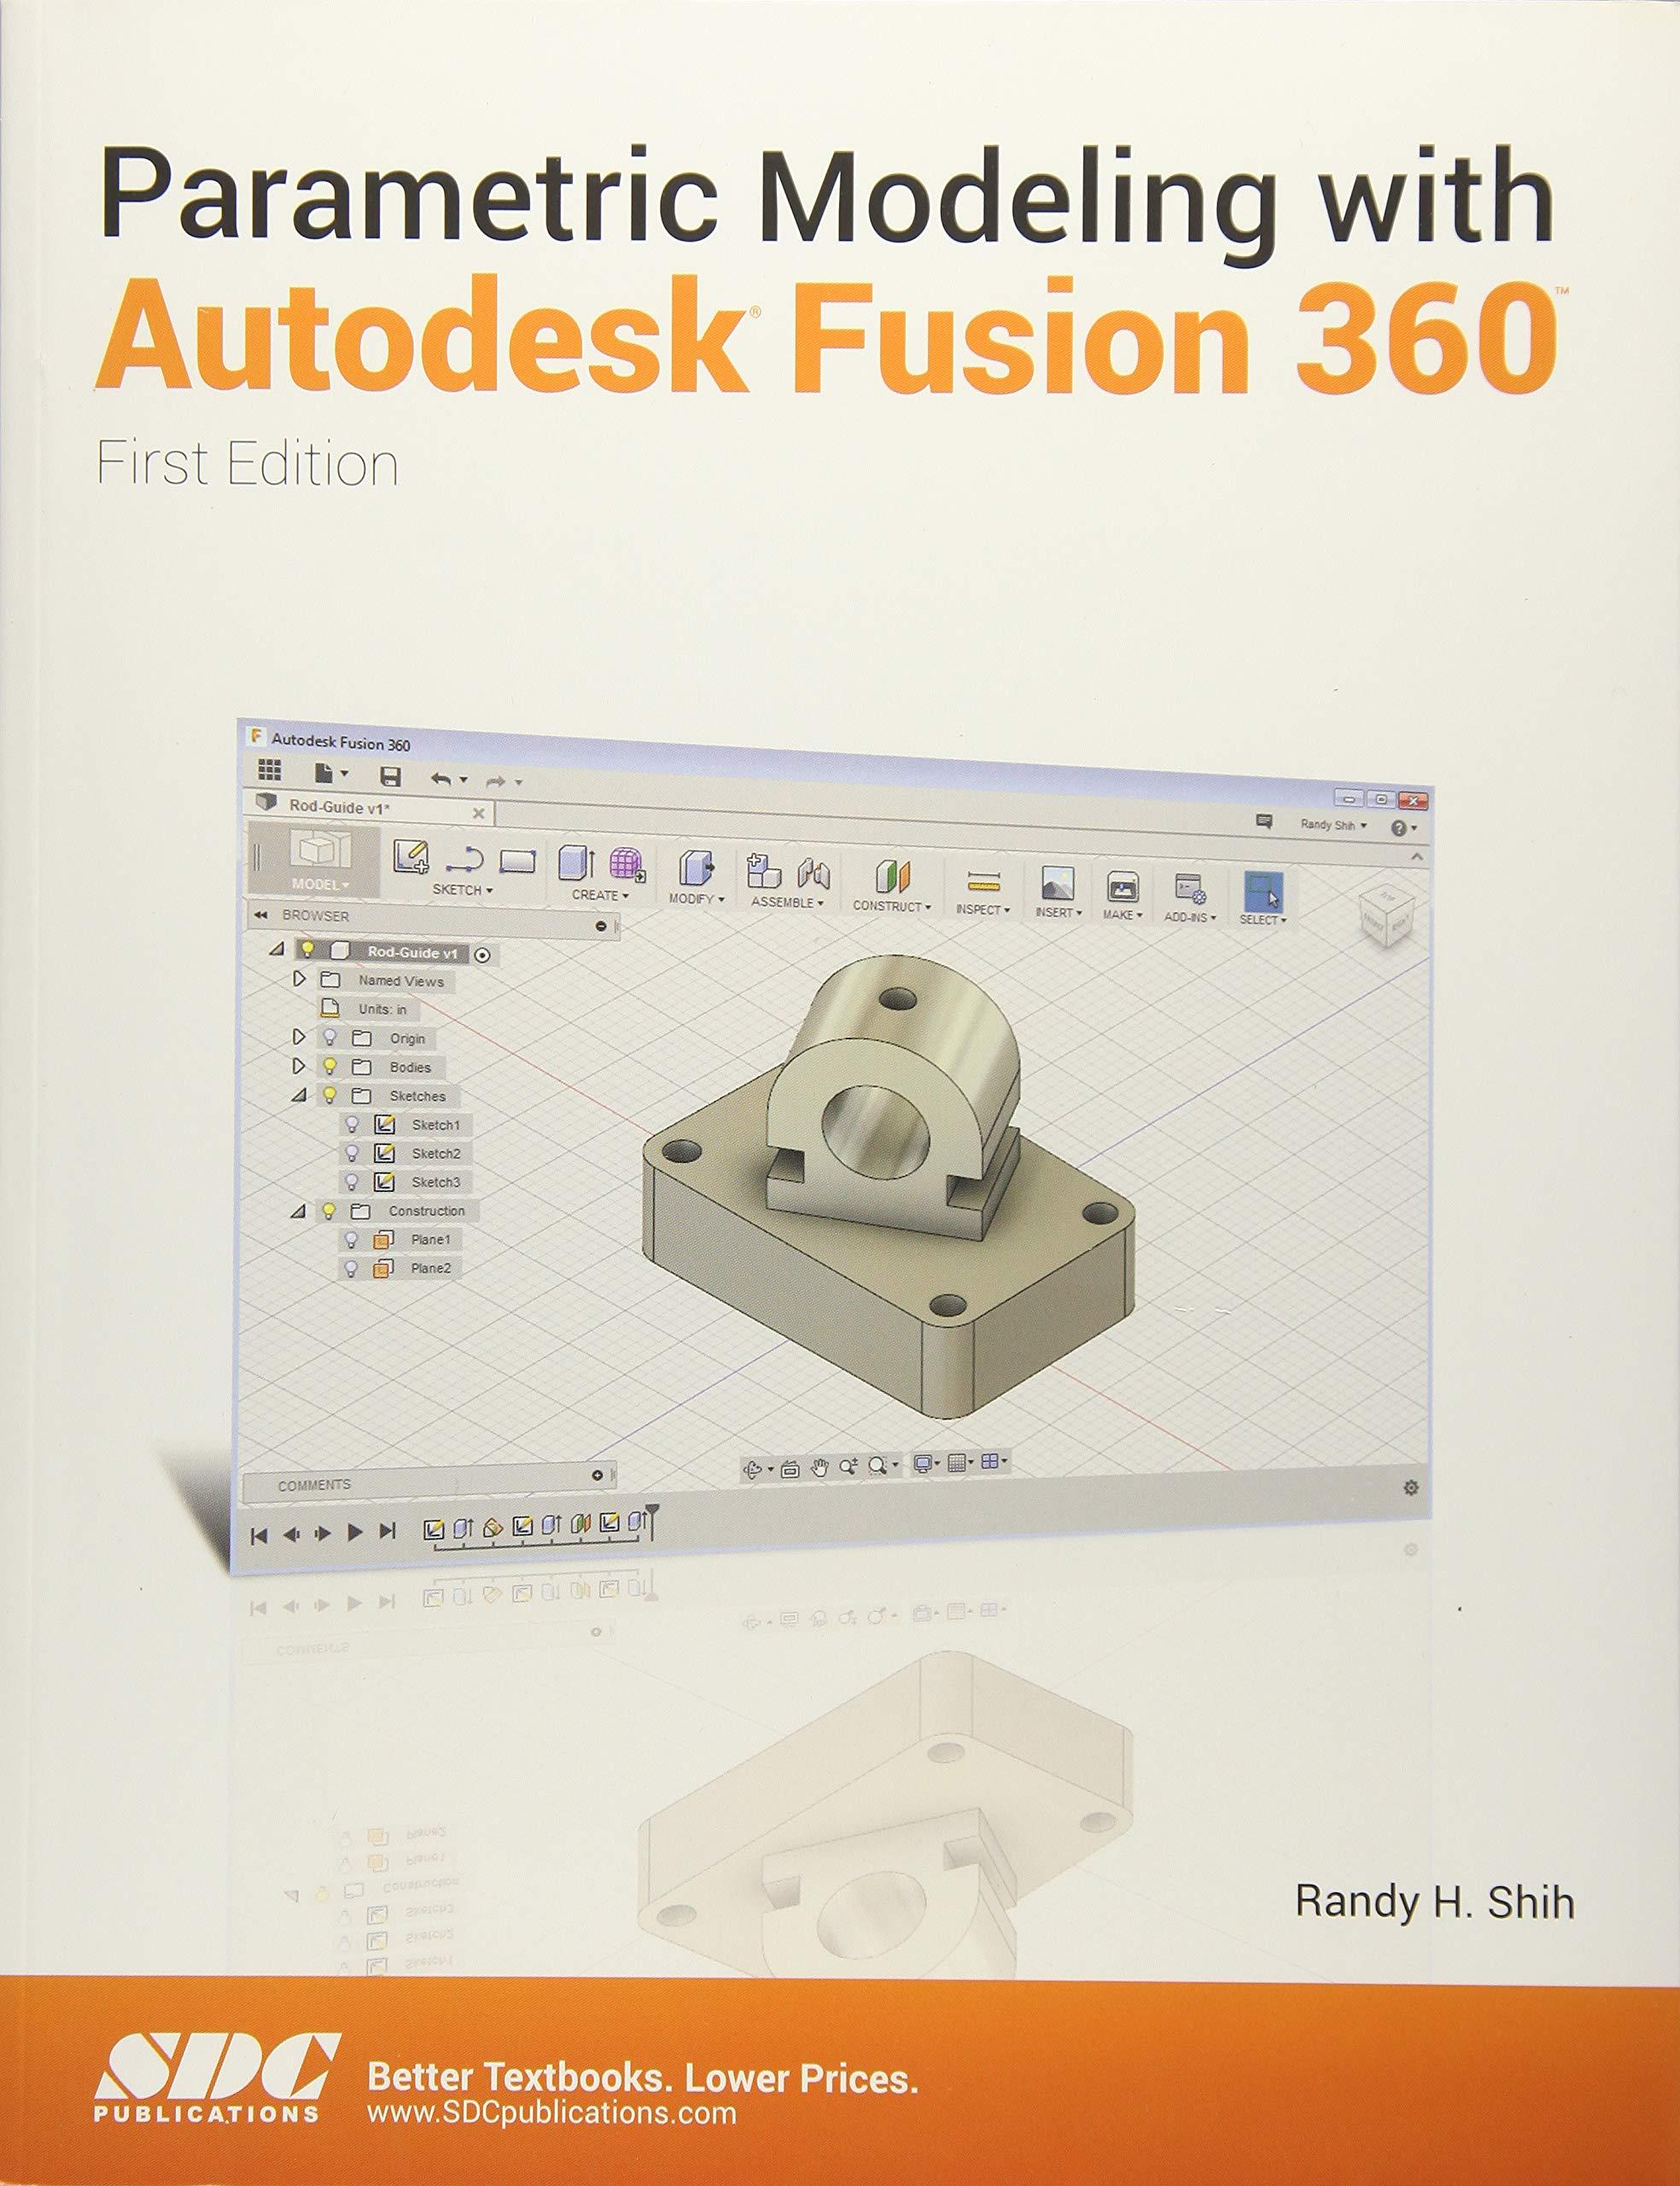 Autodesk Fusion 36